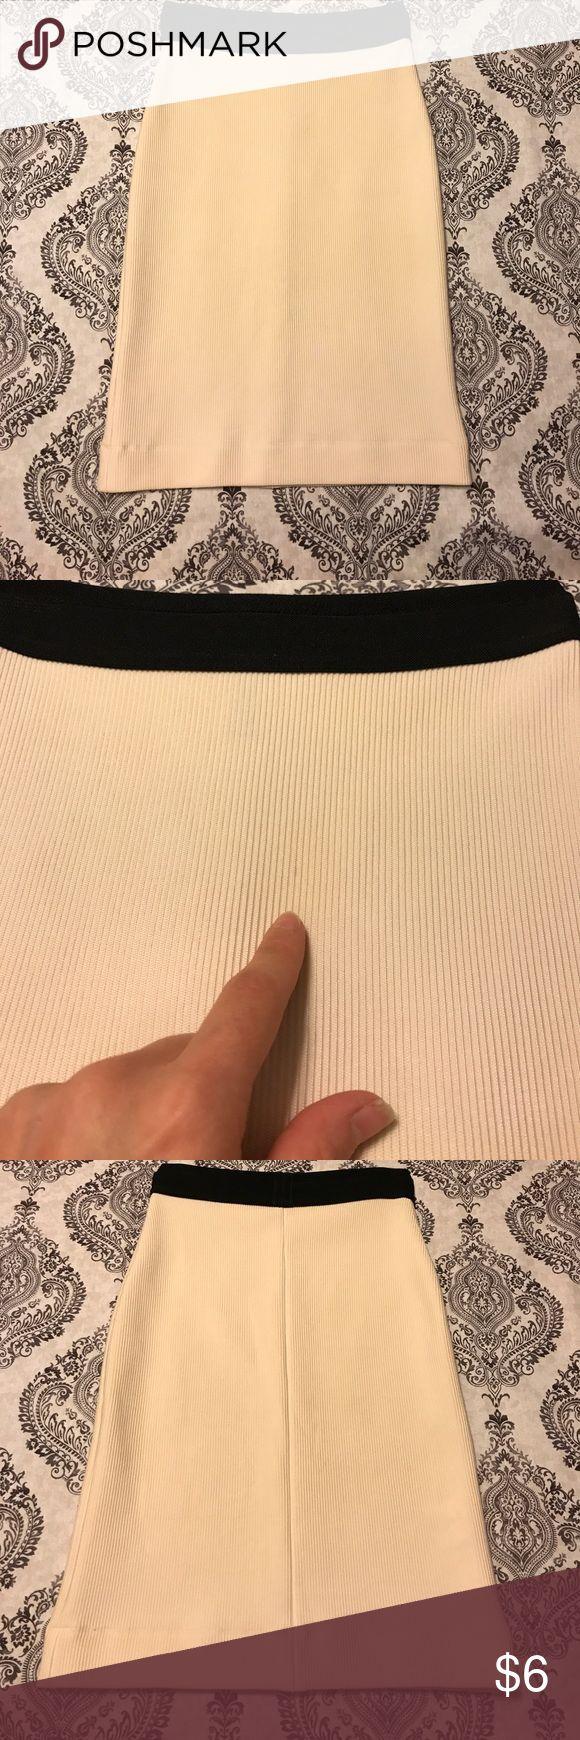 BCBGMAXAZRIA skirt size xs Good condition (one spot pictured).... made by BCBGMAXAZRIA....size xsmall....off white BCBGMaxAzria Skirts